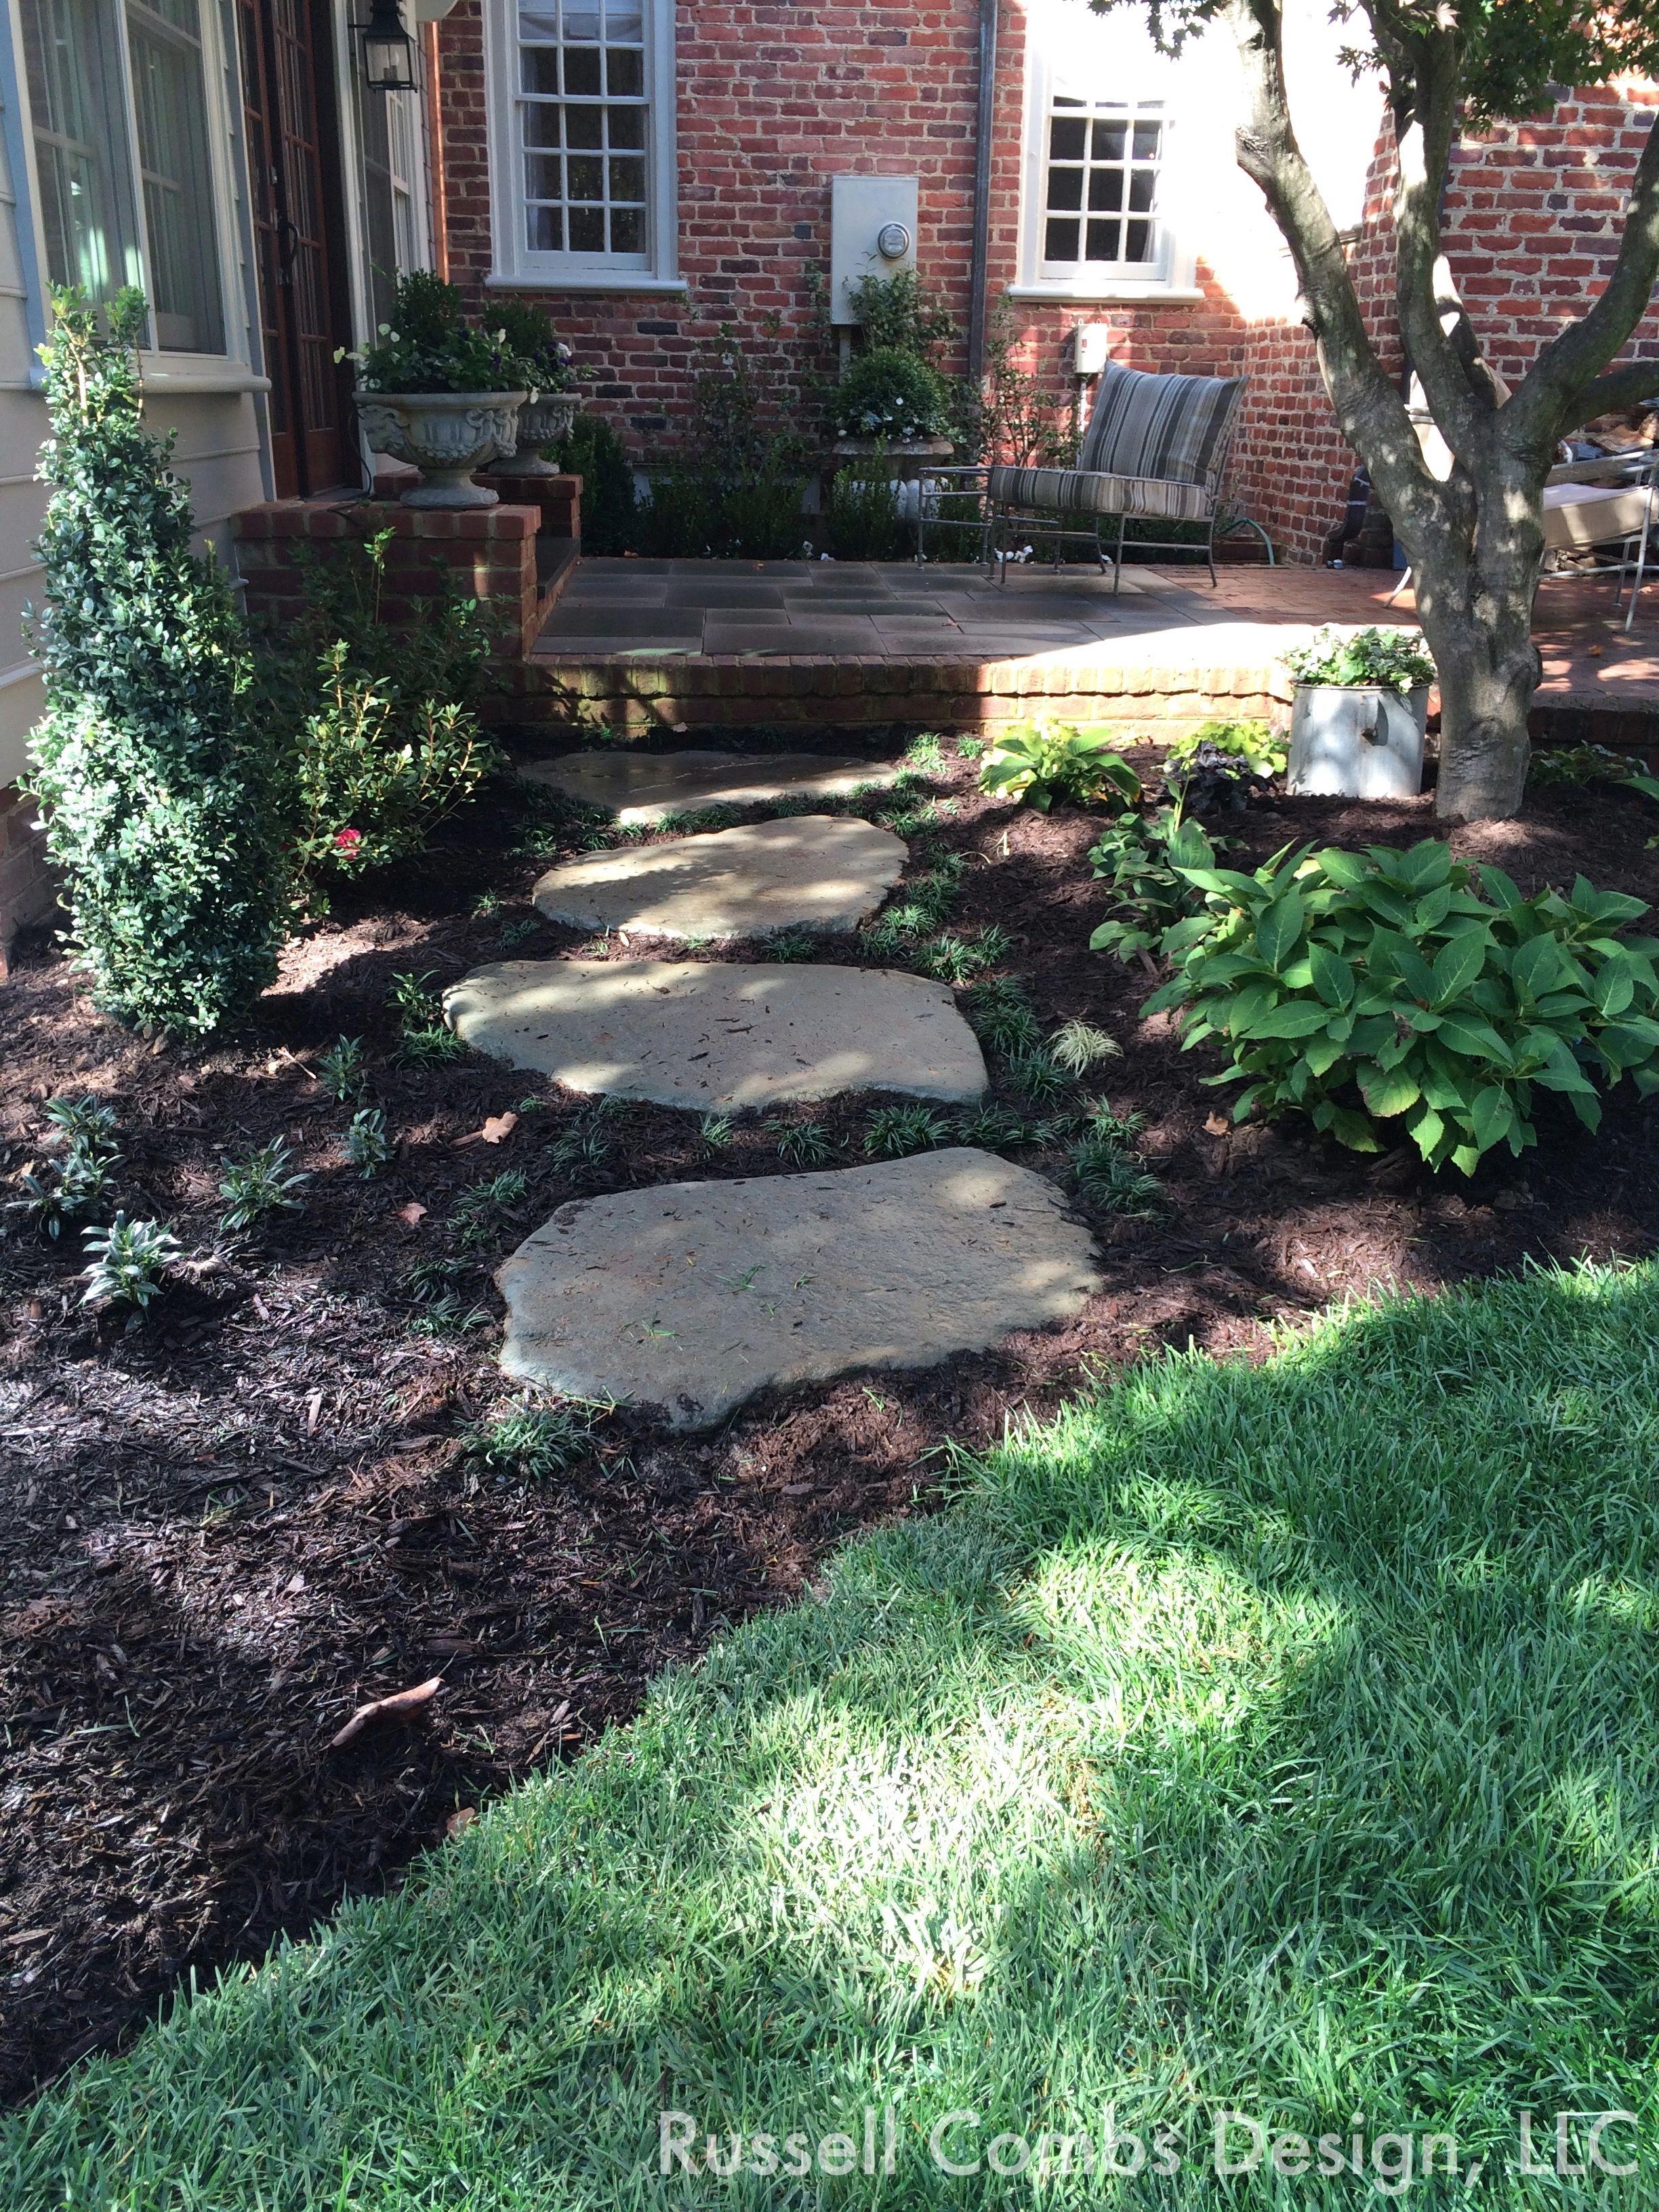 Bluestone Stepping Stones Create Path Through Shade Perennial Bed Connects Bluestone Terrace To Lawn Shade Perennials Garden Design Lawn